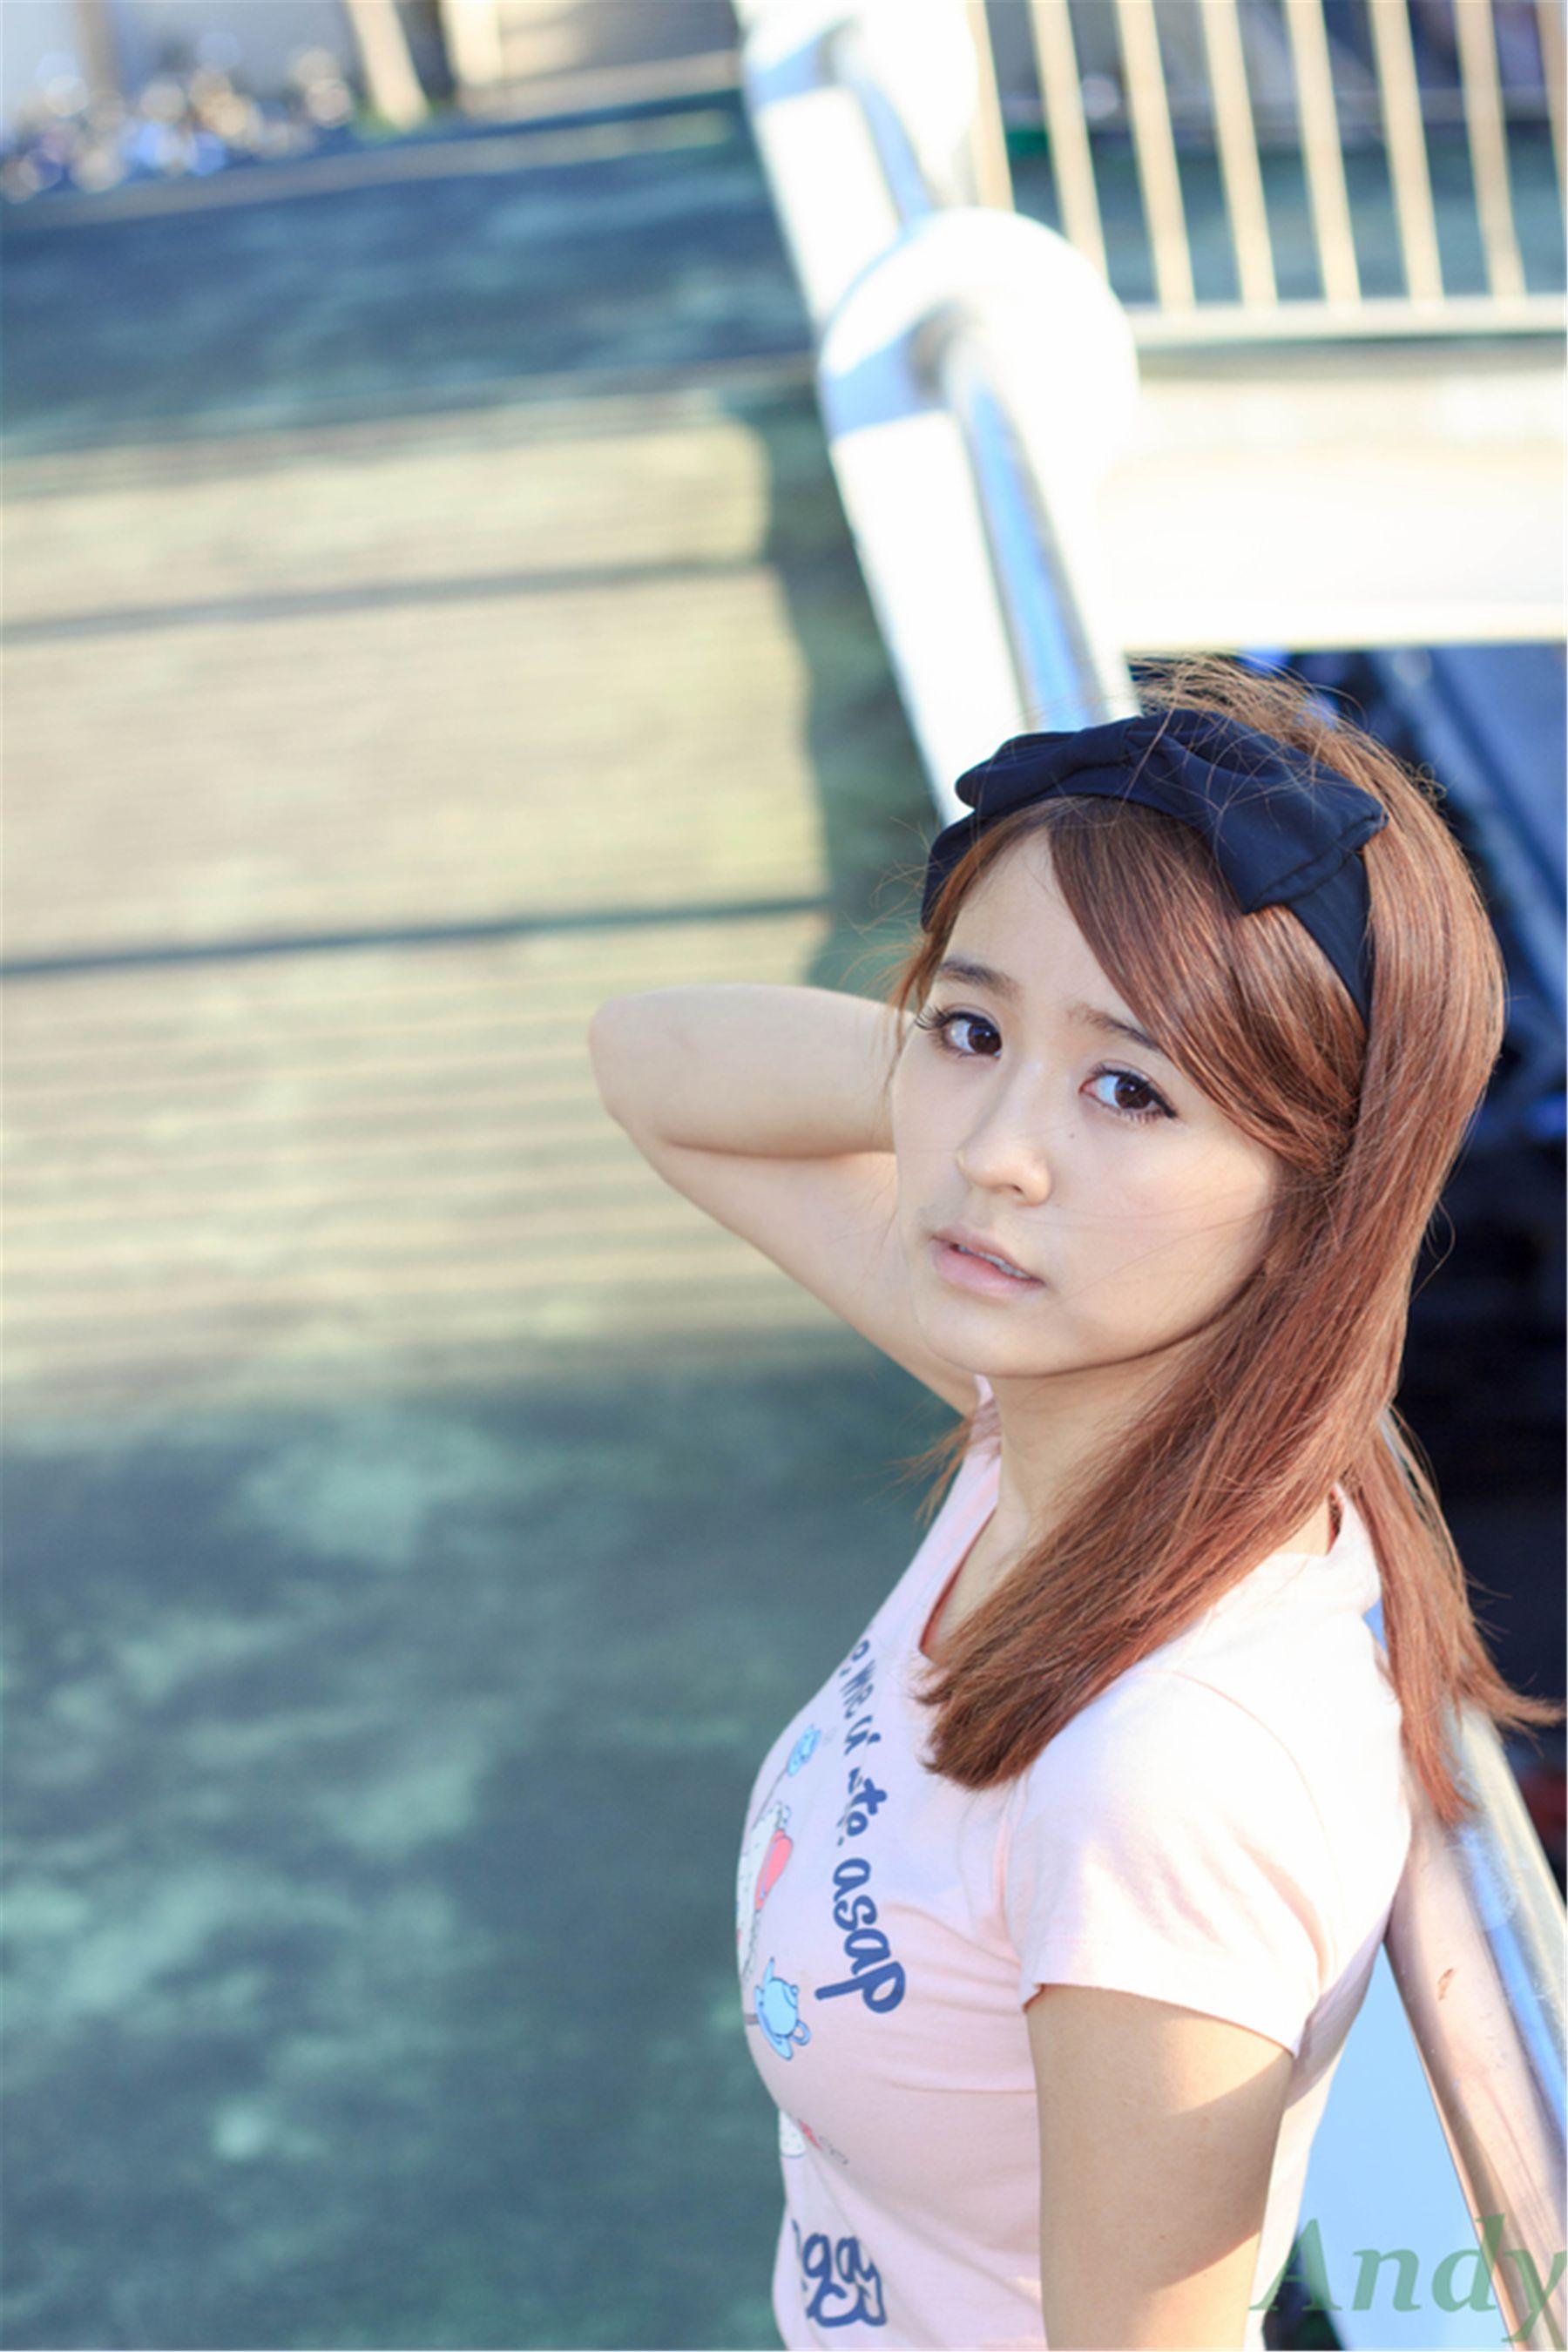 VOL.463 [台湾正妹]清纯甜美正妹:郭燕陵(圈圈)高品质写真套图(41P)